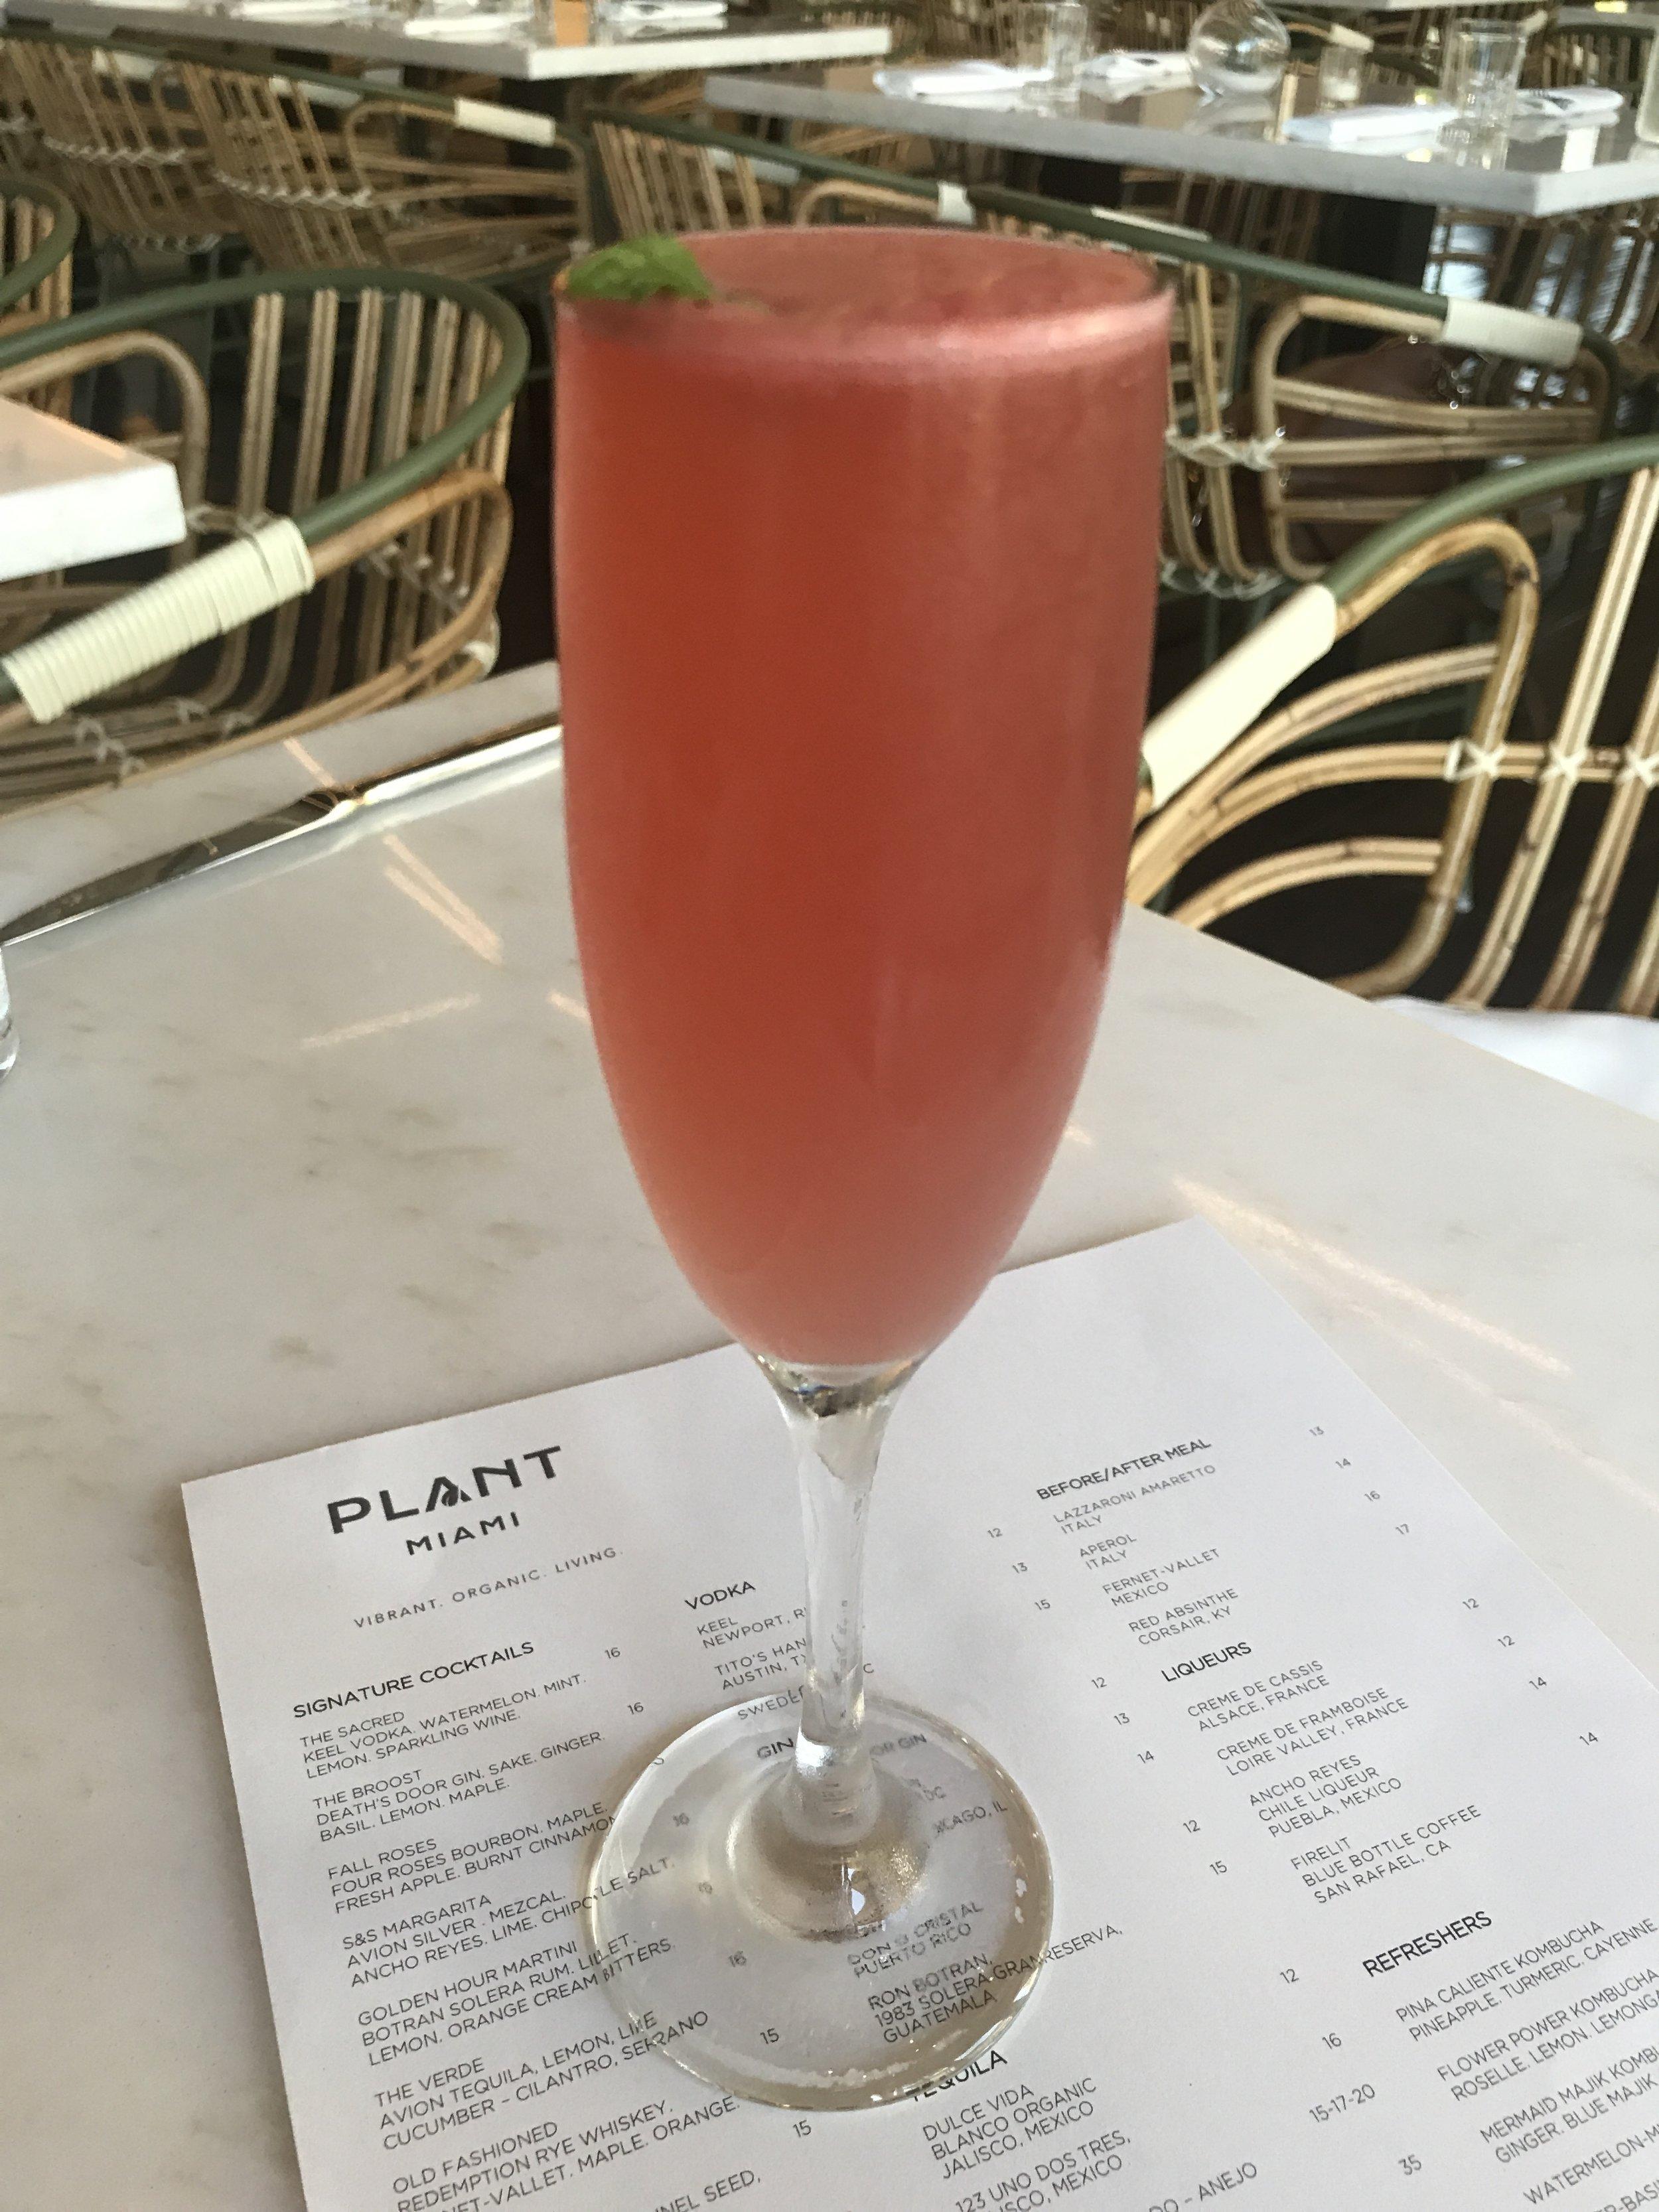 Plant Miami Keel Vodka Sacred